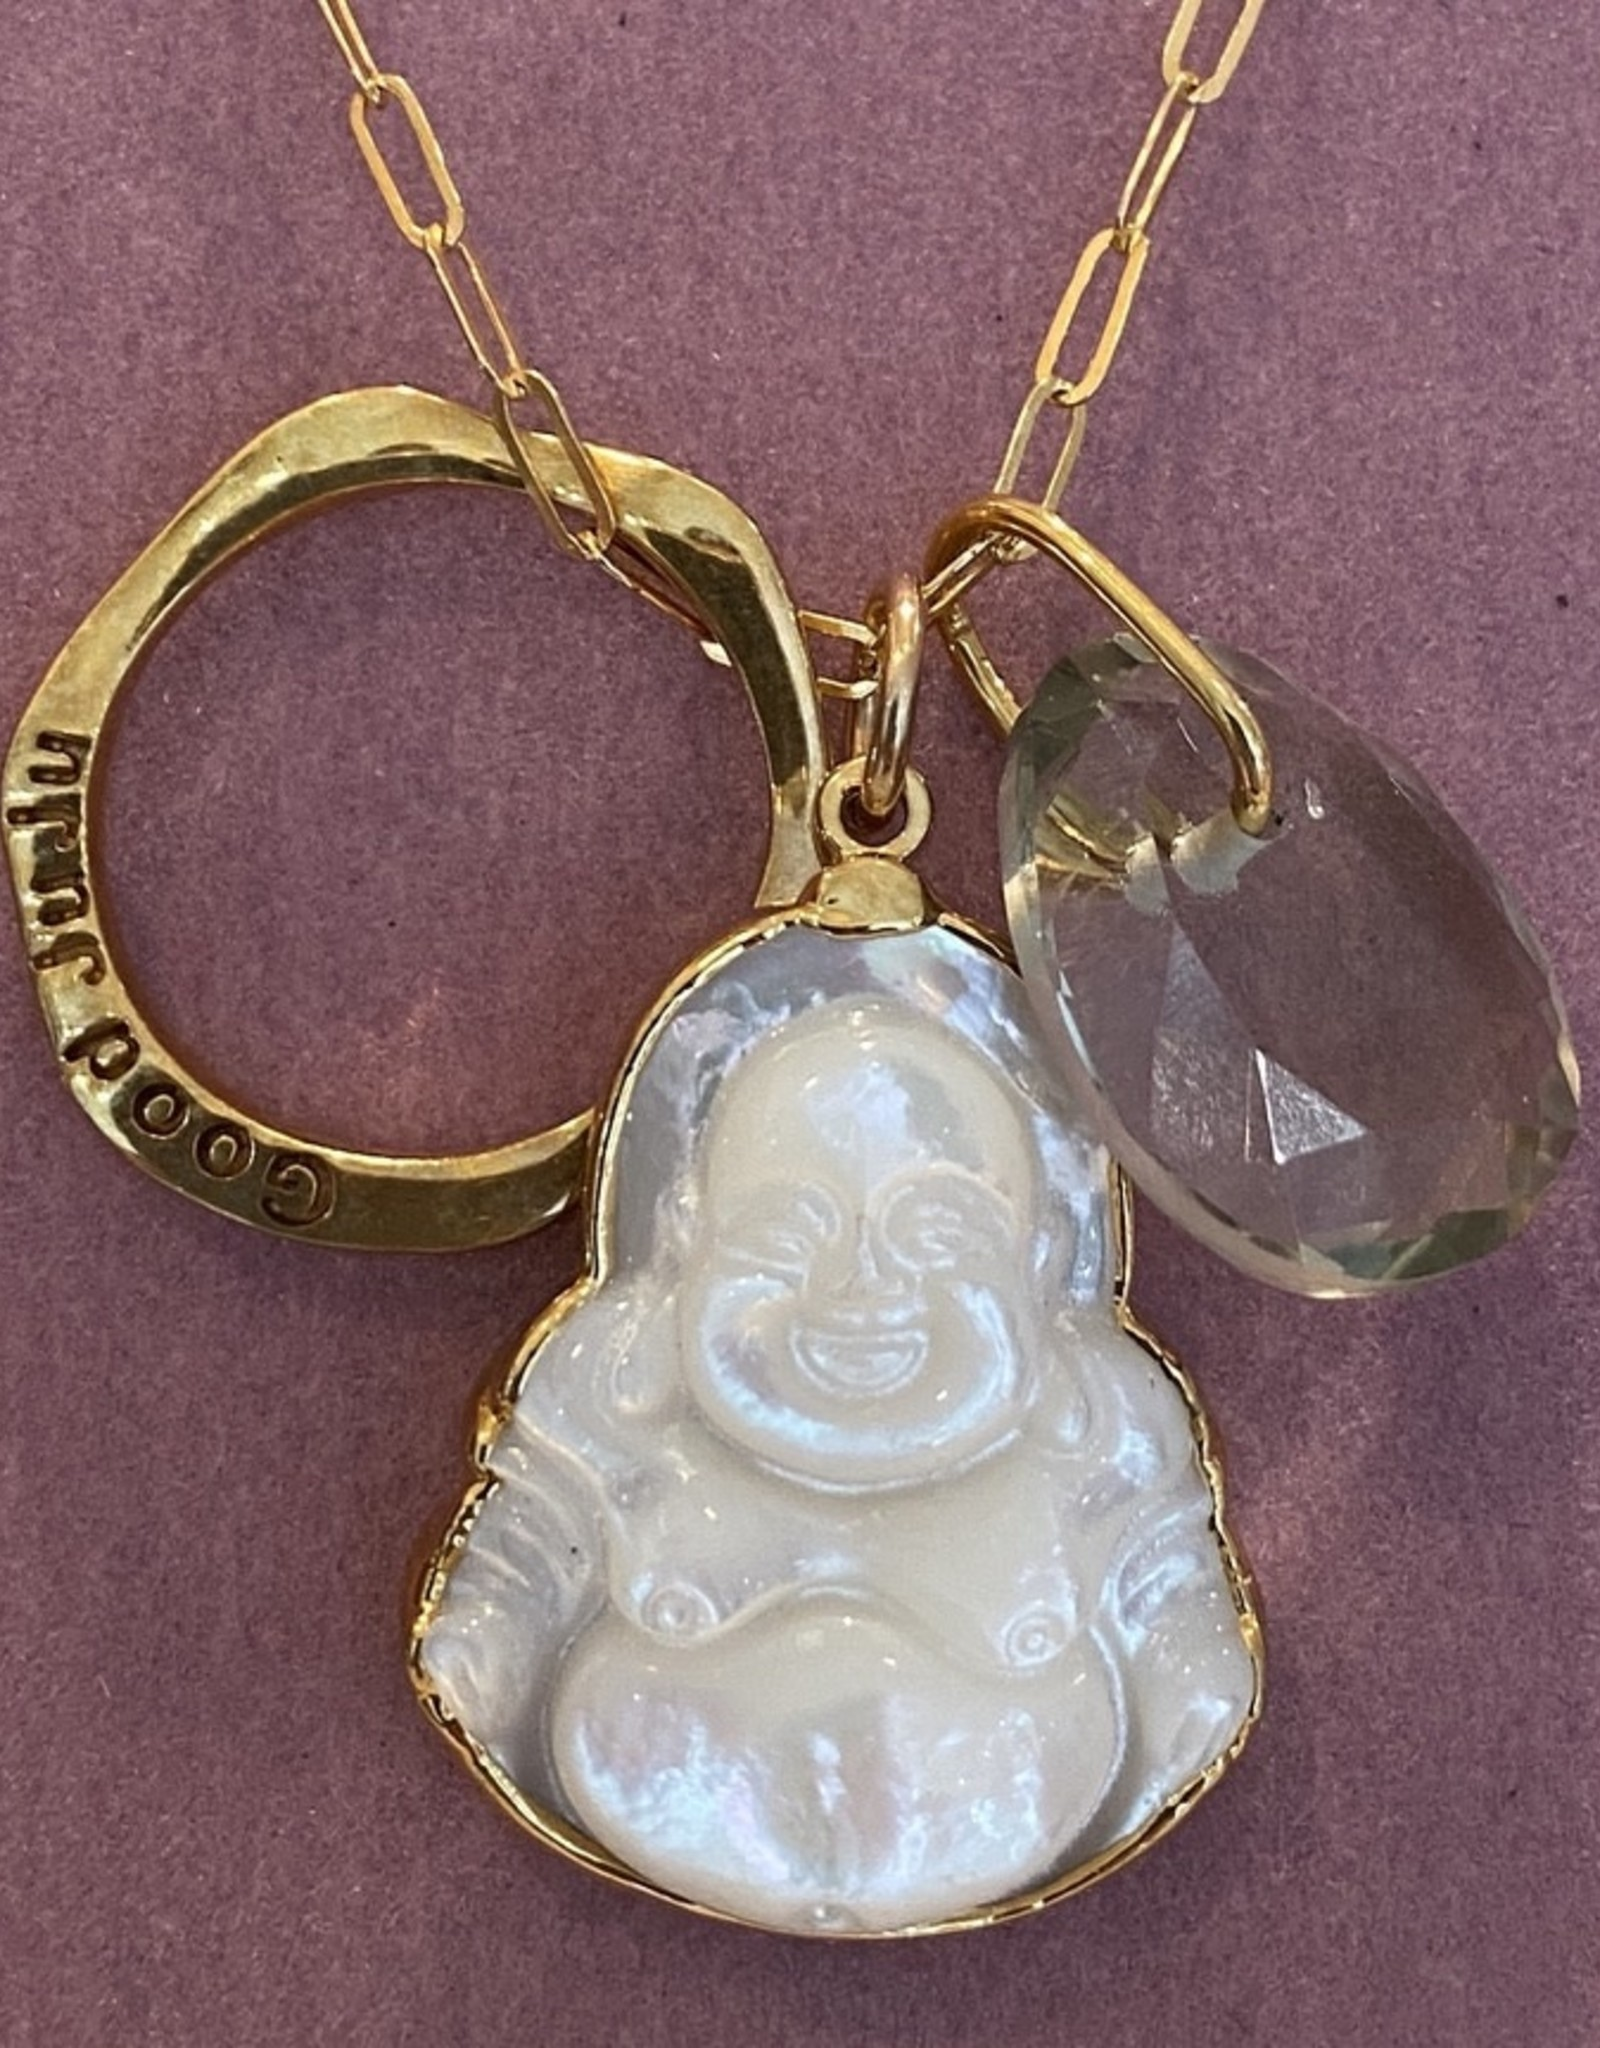 Inner Zen gold plate necklace